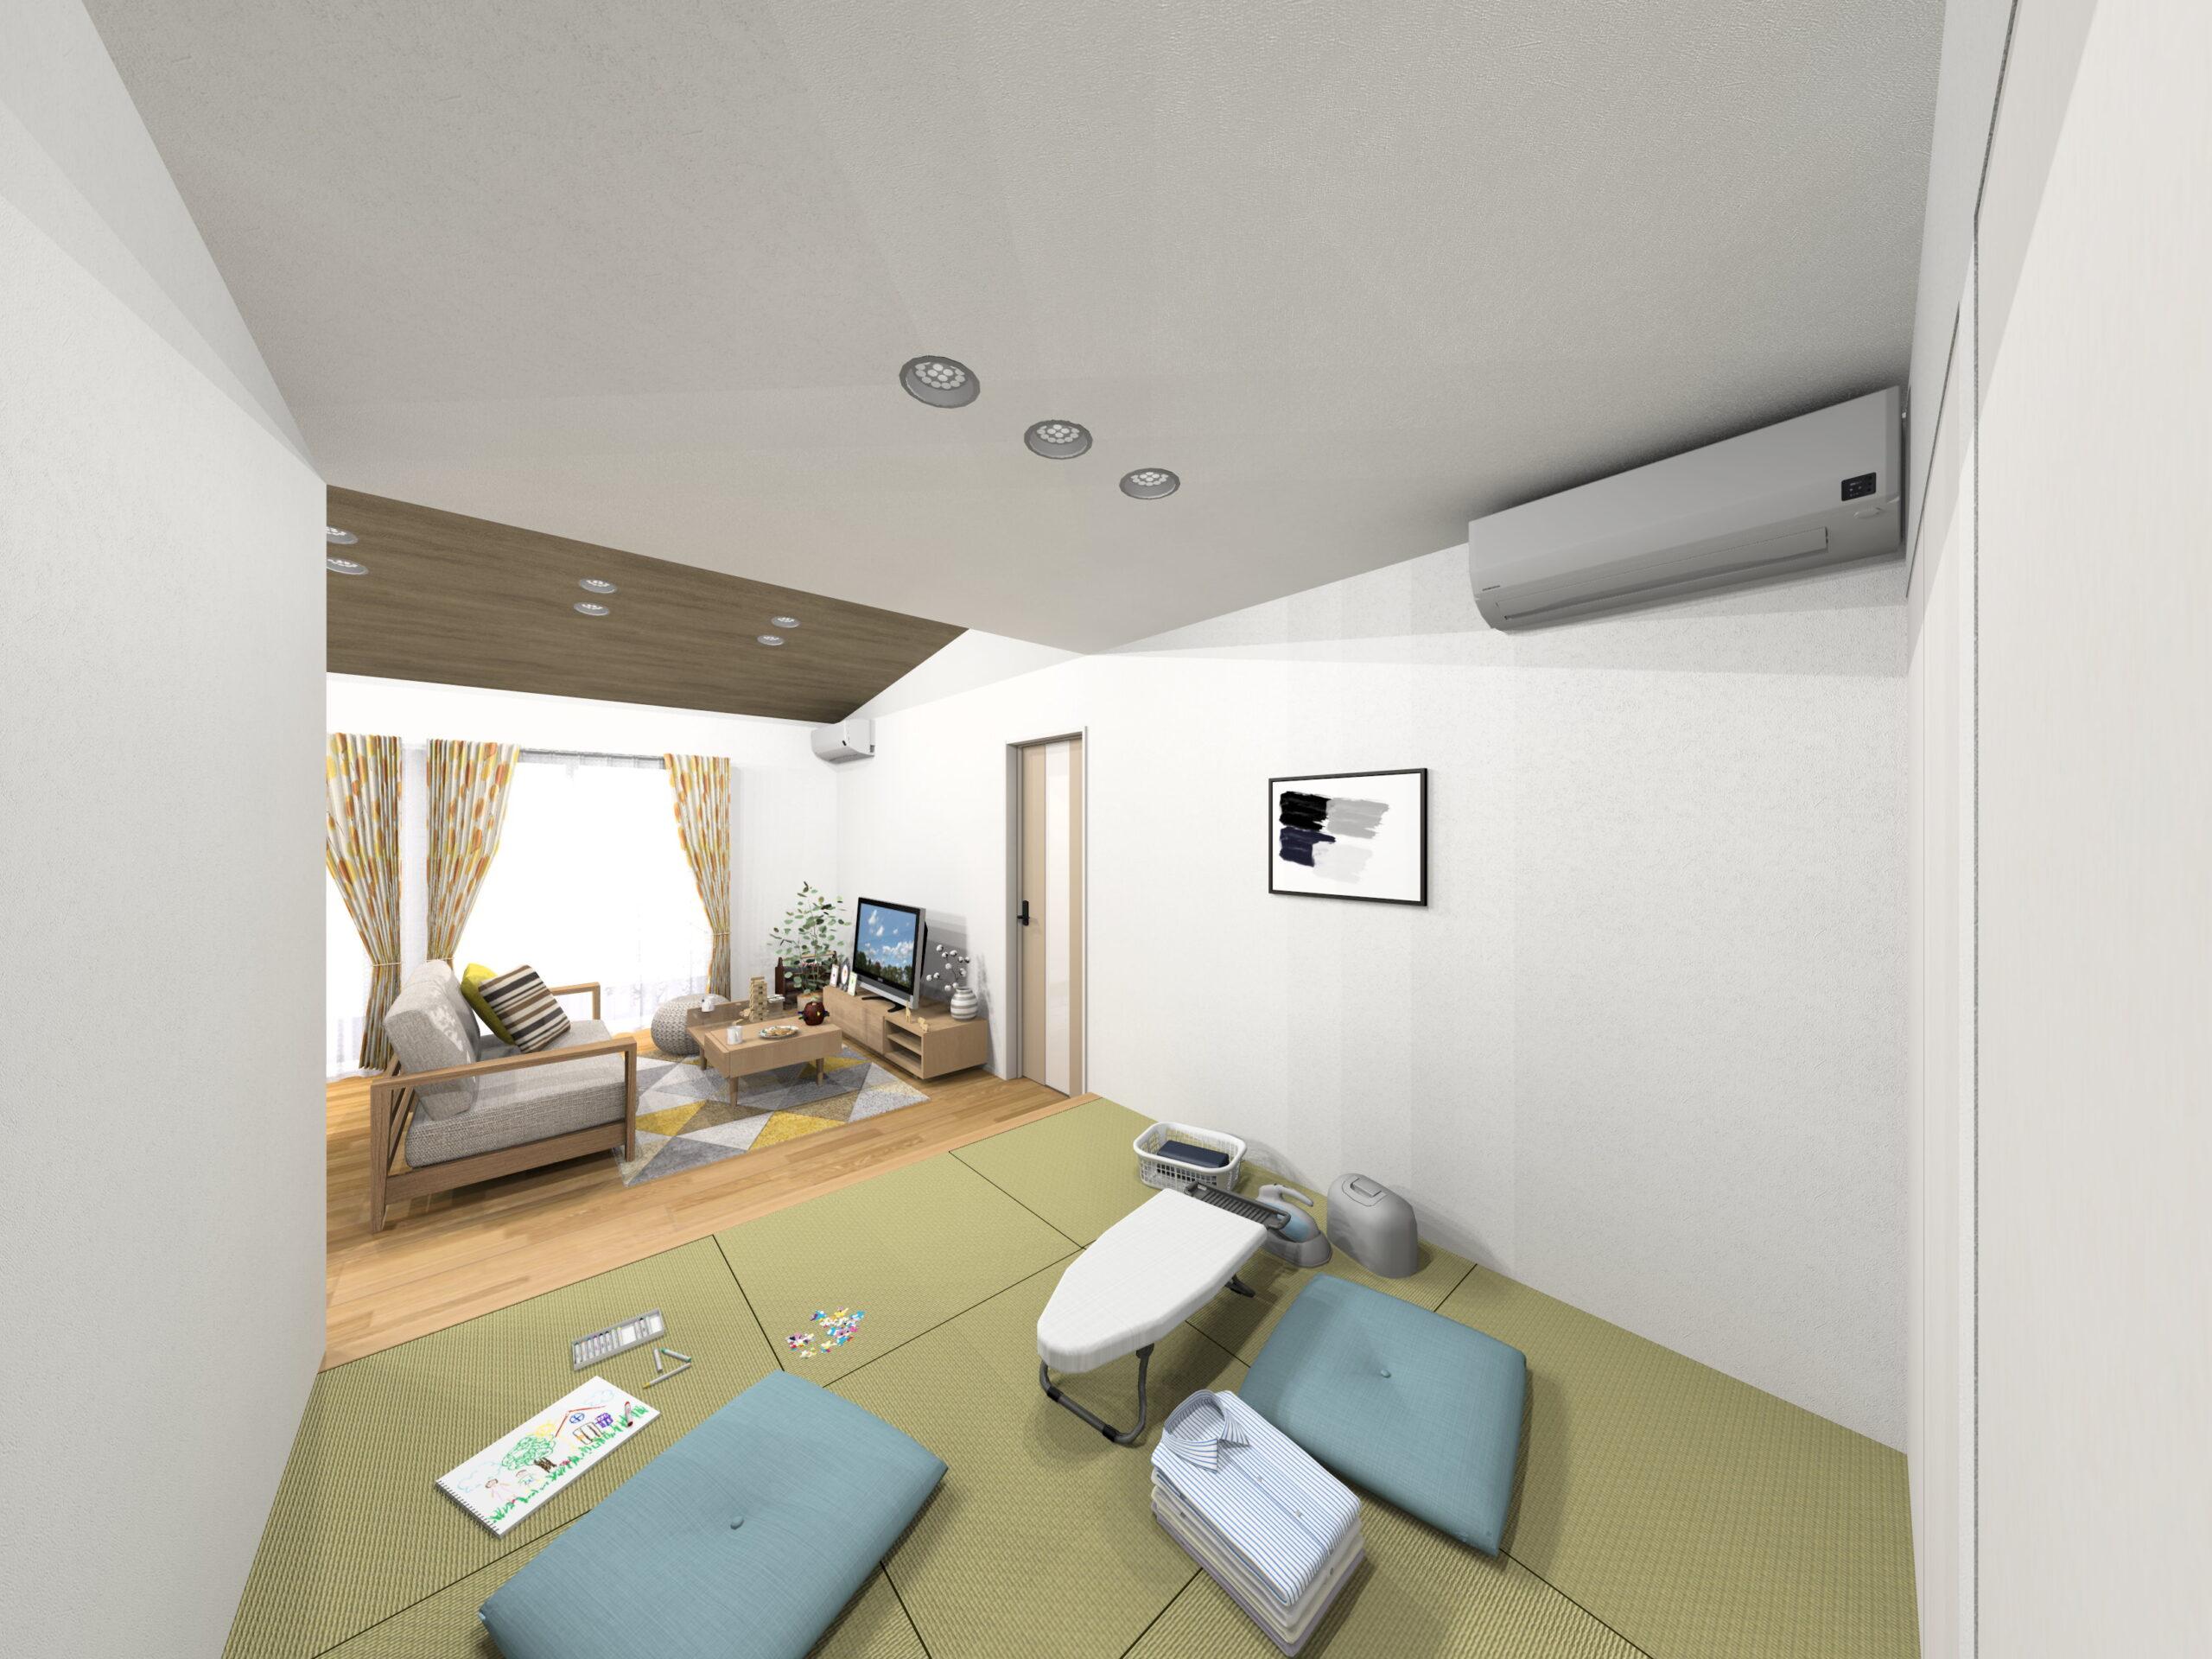 嬉野市新築建売住宅「OURS下宿」4号地和室パース